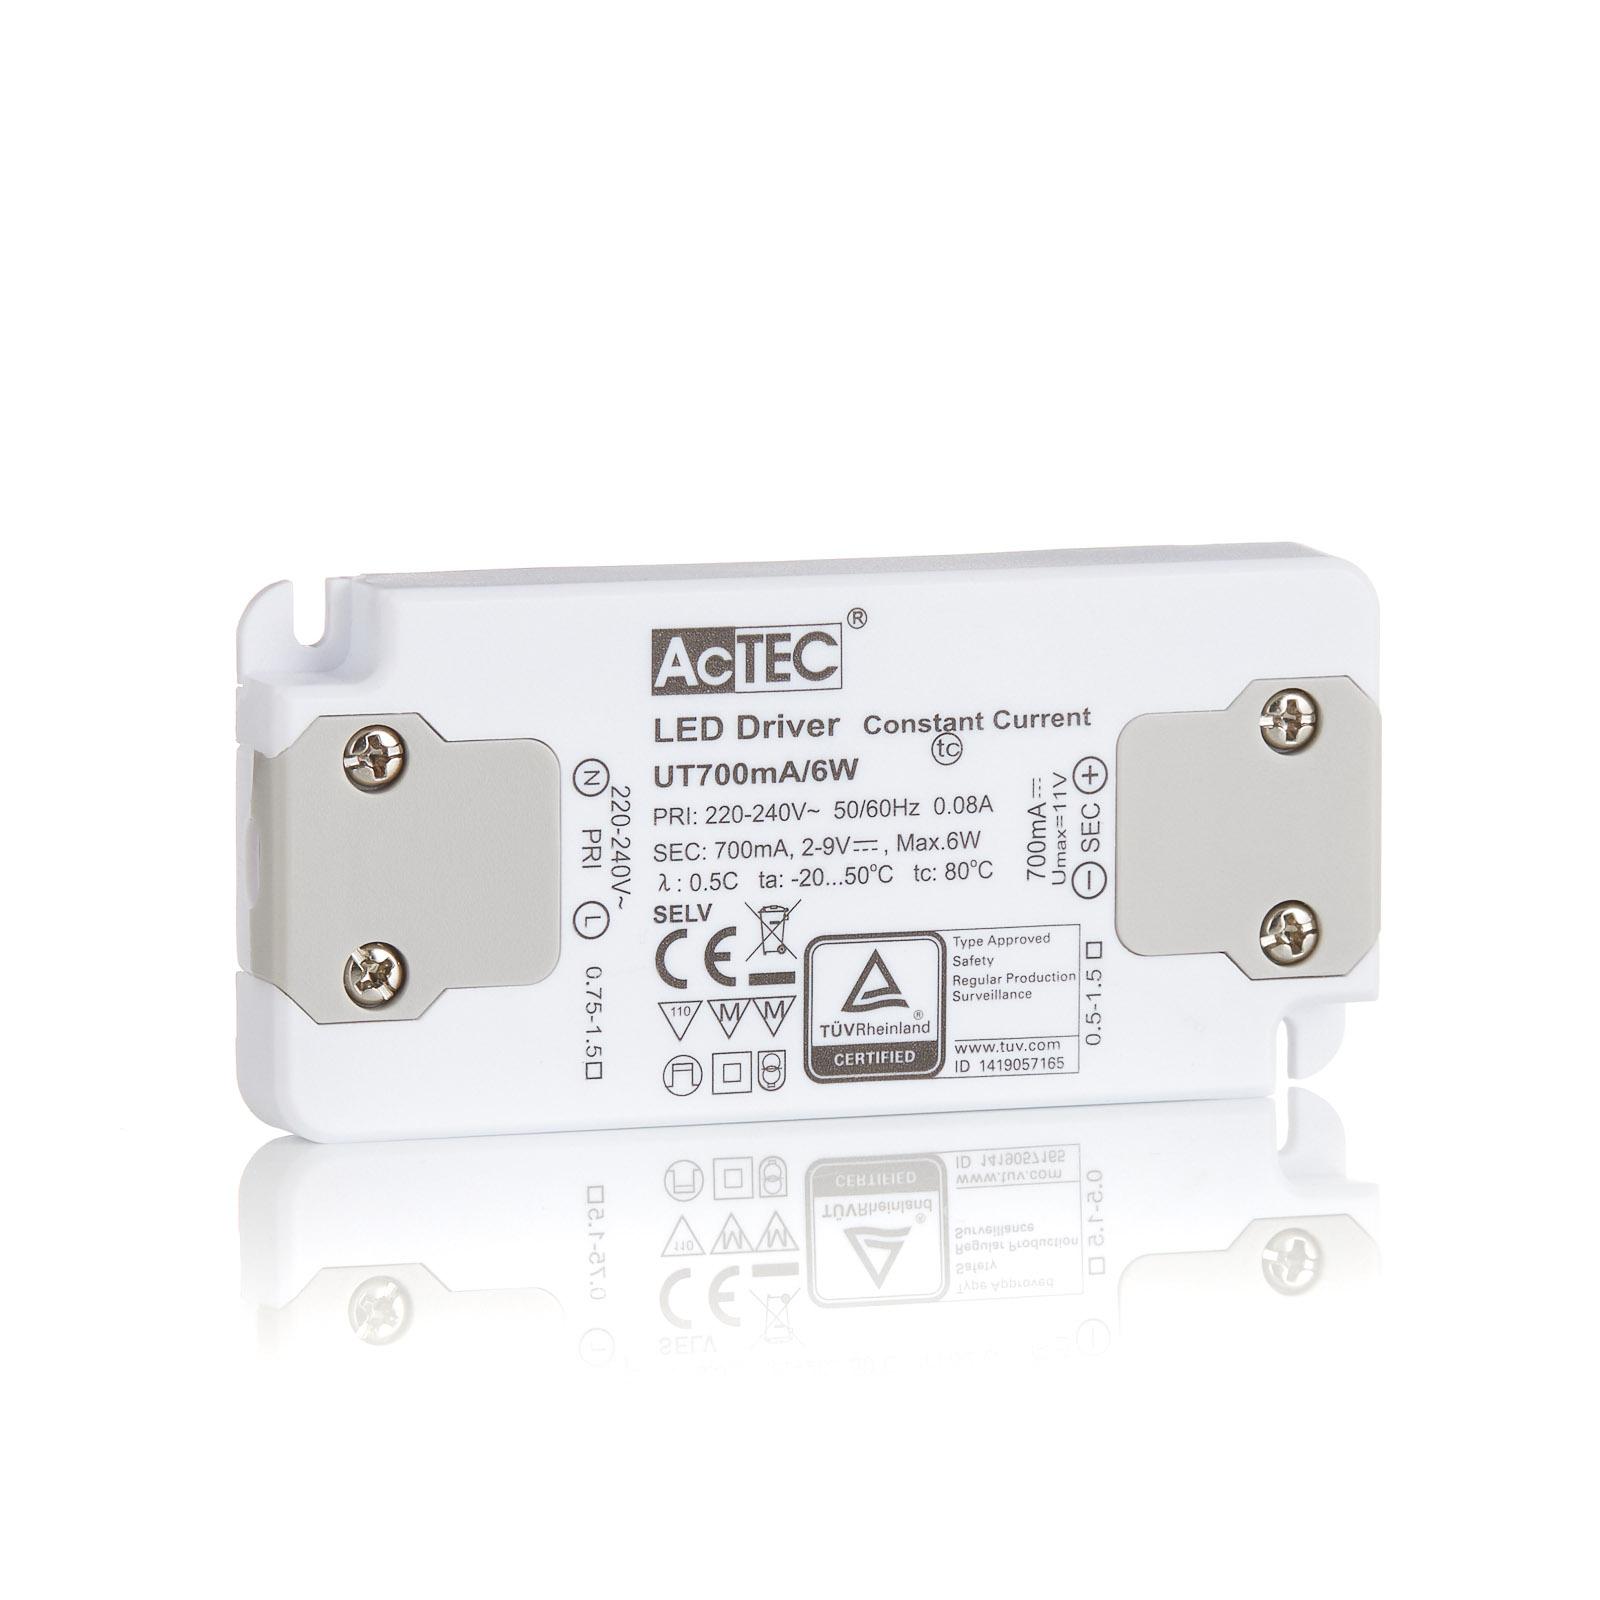 AcTEC Slim LED-Treiber CC 700mA, 6W